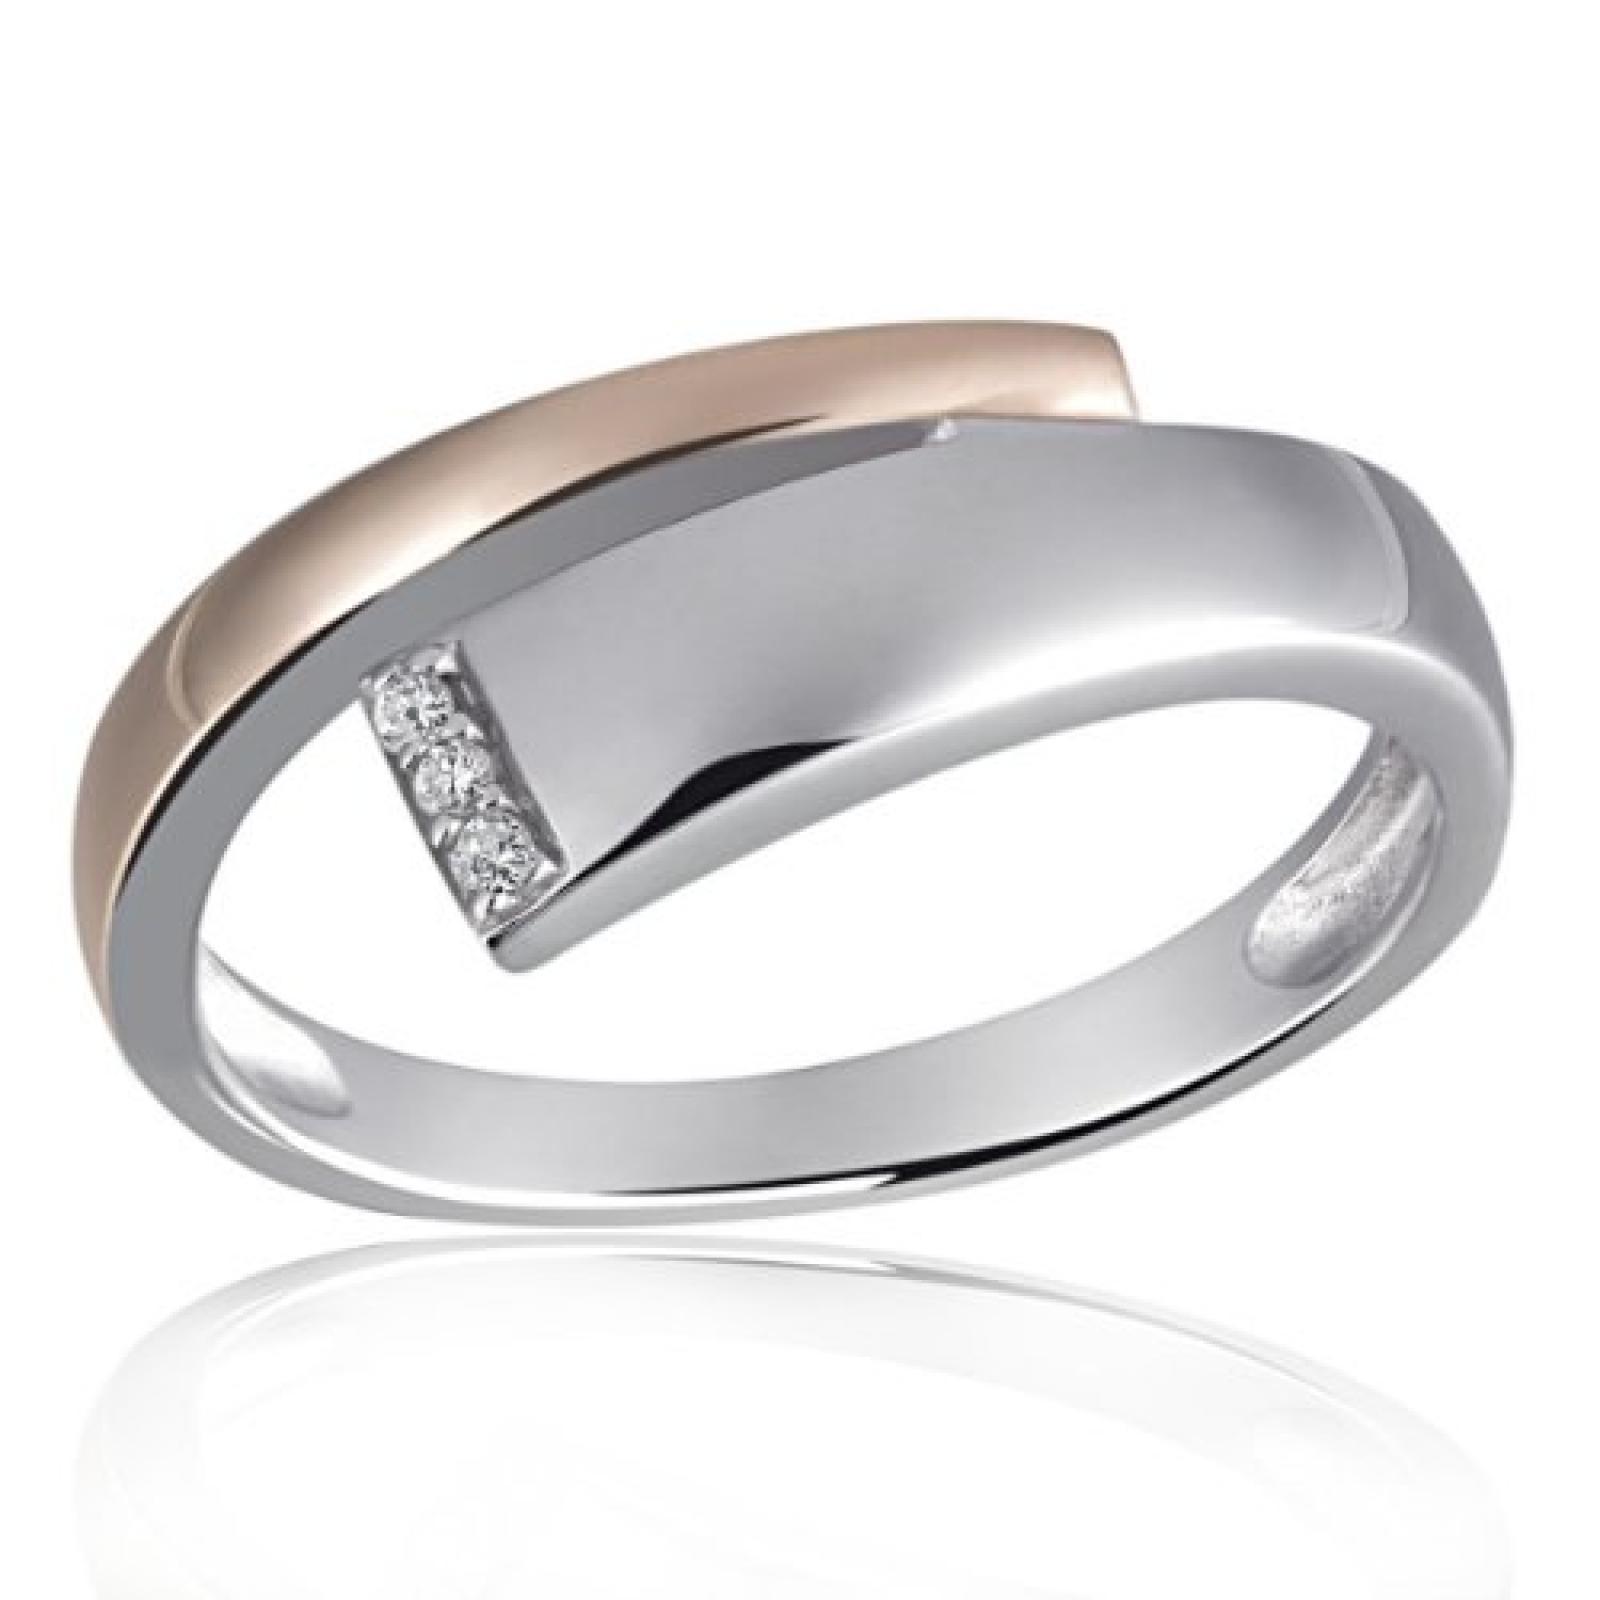 Goldmaid Damen-Ring 925 Sterling Silber weiß Diamanten Bicolor 3 Diamanten 0,03 ct. Sd R6118S52